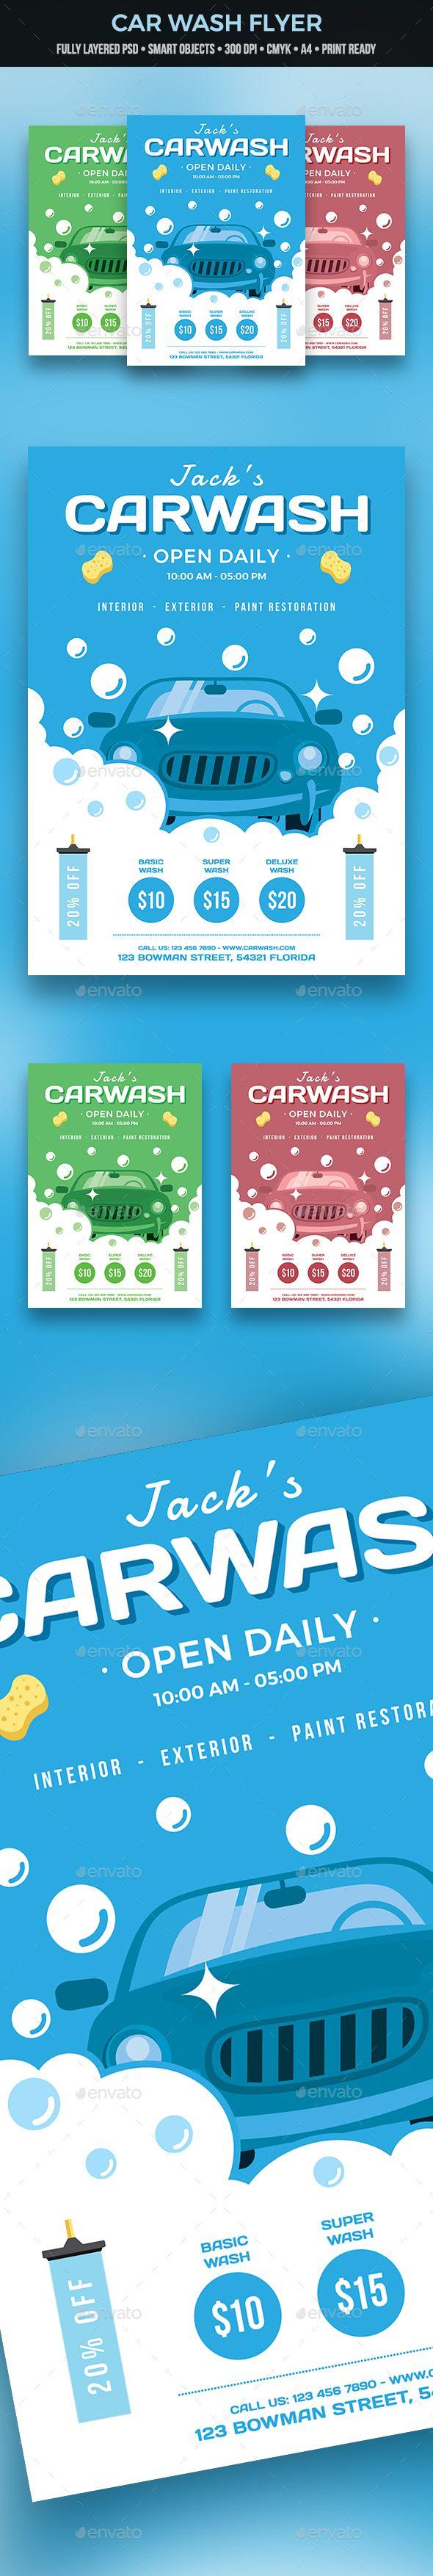 Car Wash Flyer  Car Wash Font Logo And Fonts